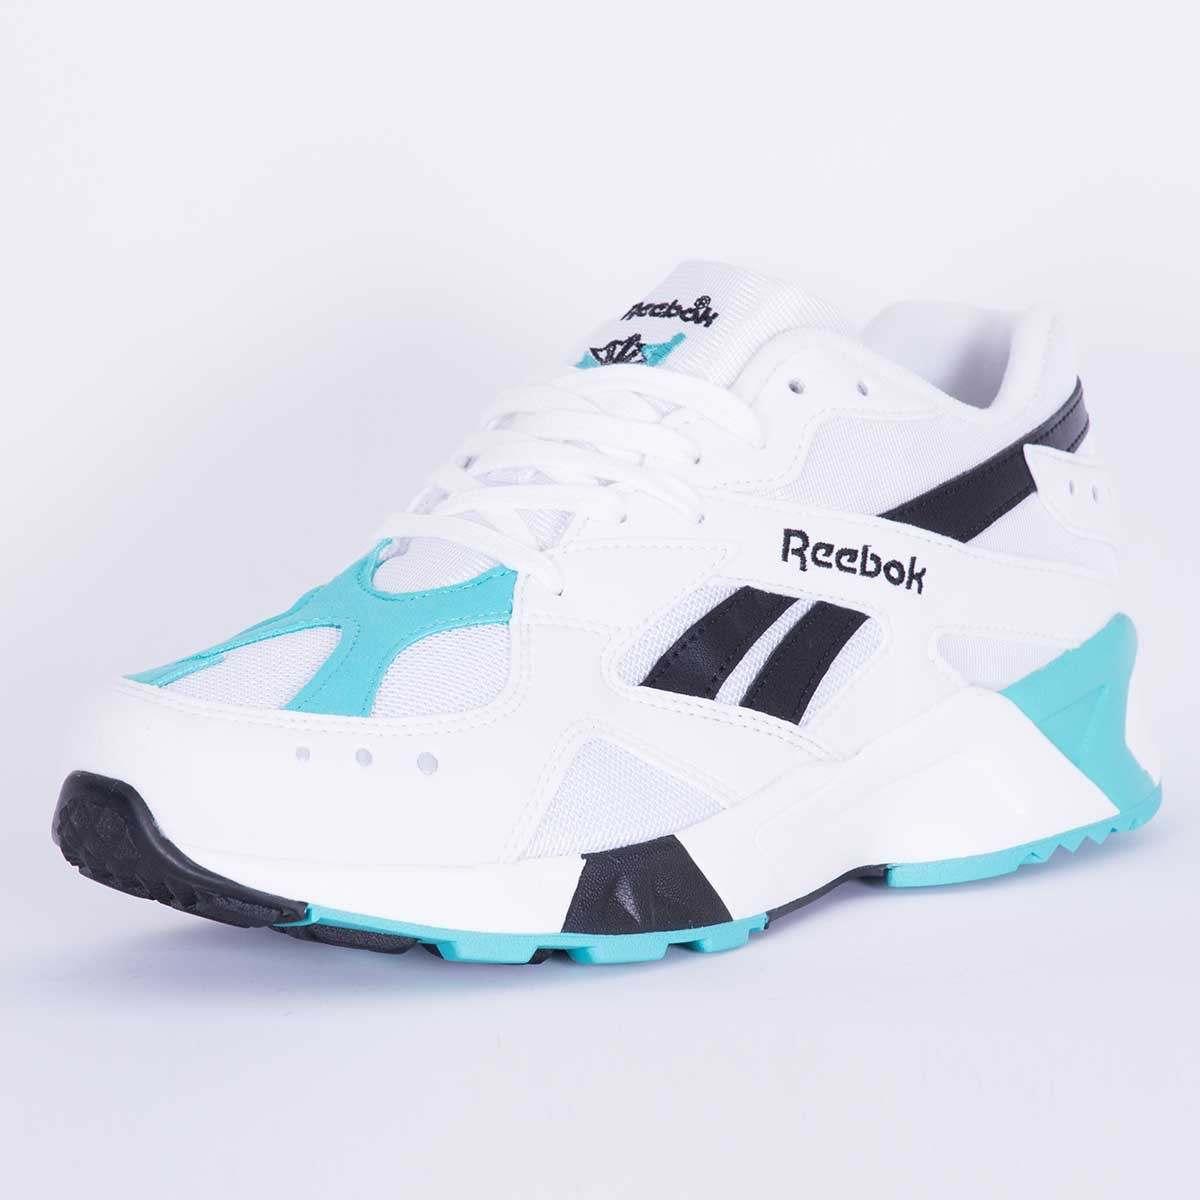 Reebok Aztrek - 1990's Style Dad Shoes @ Well gosh